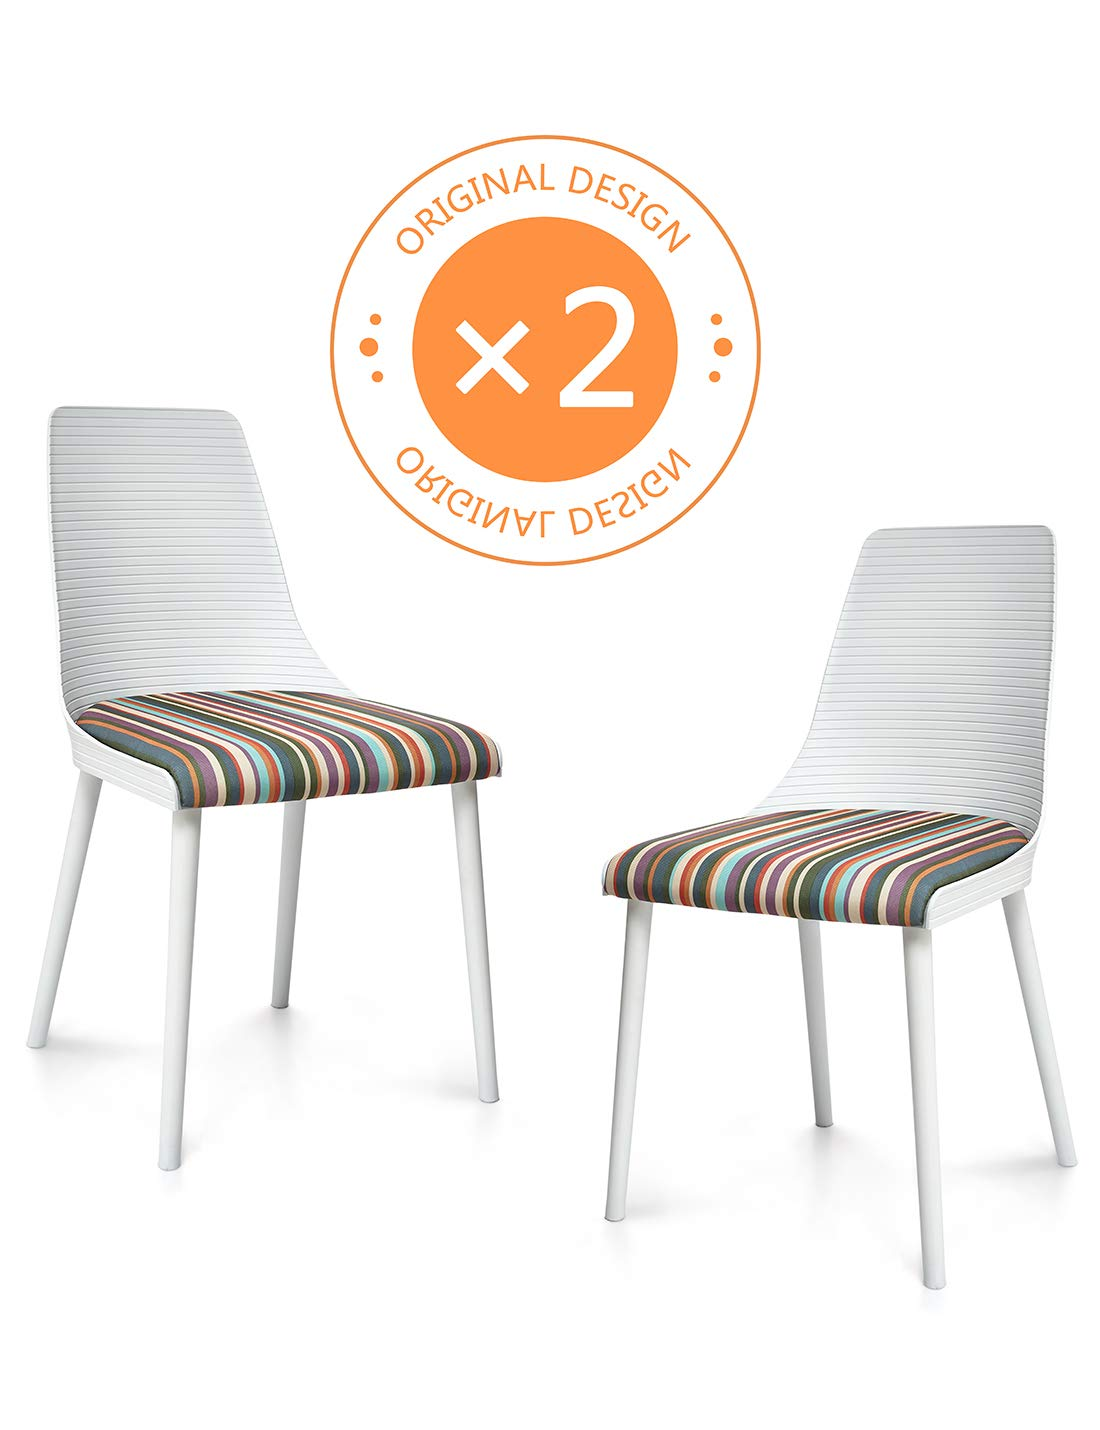 Suhu Lot De 2 Chaises Salle A Manger Design Chaise Empilable Bistrot